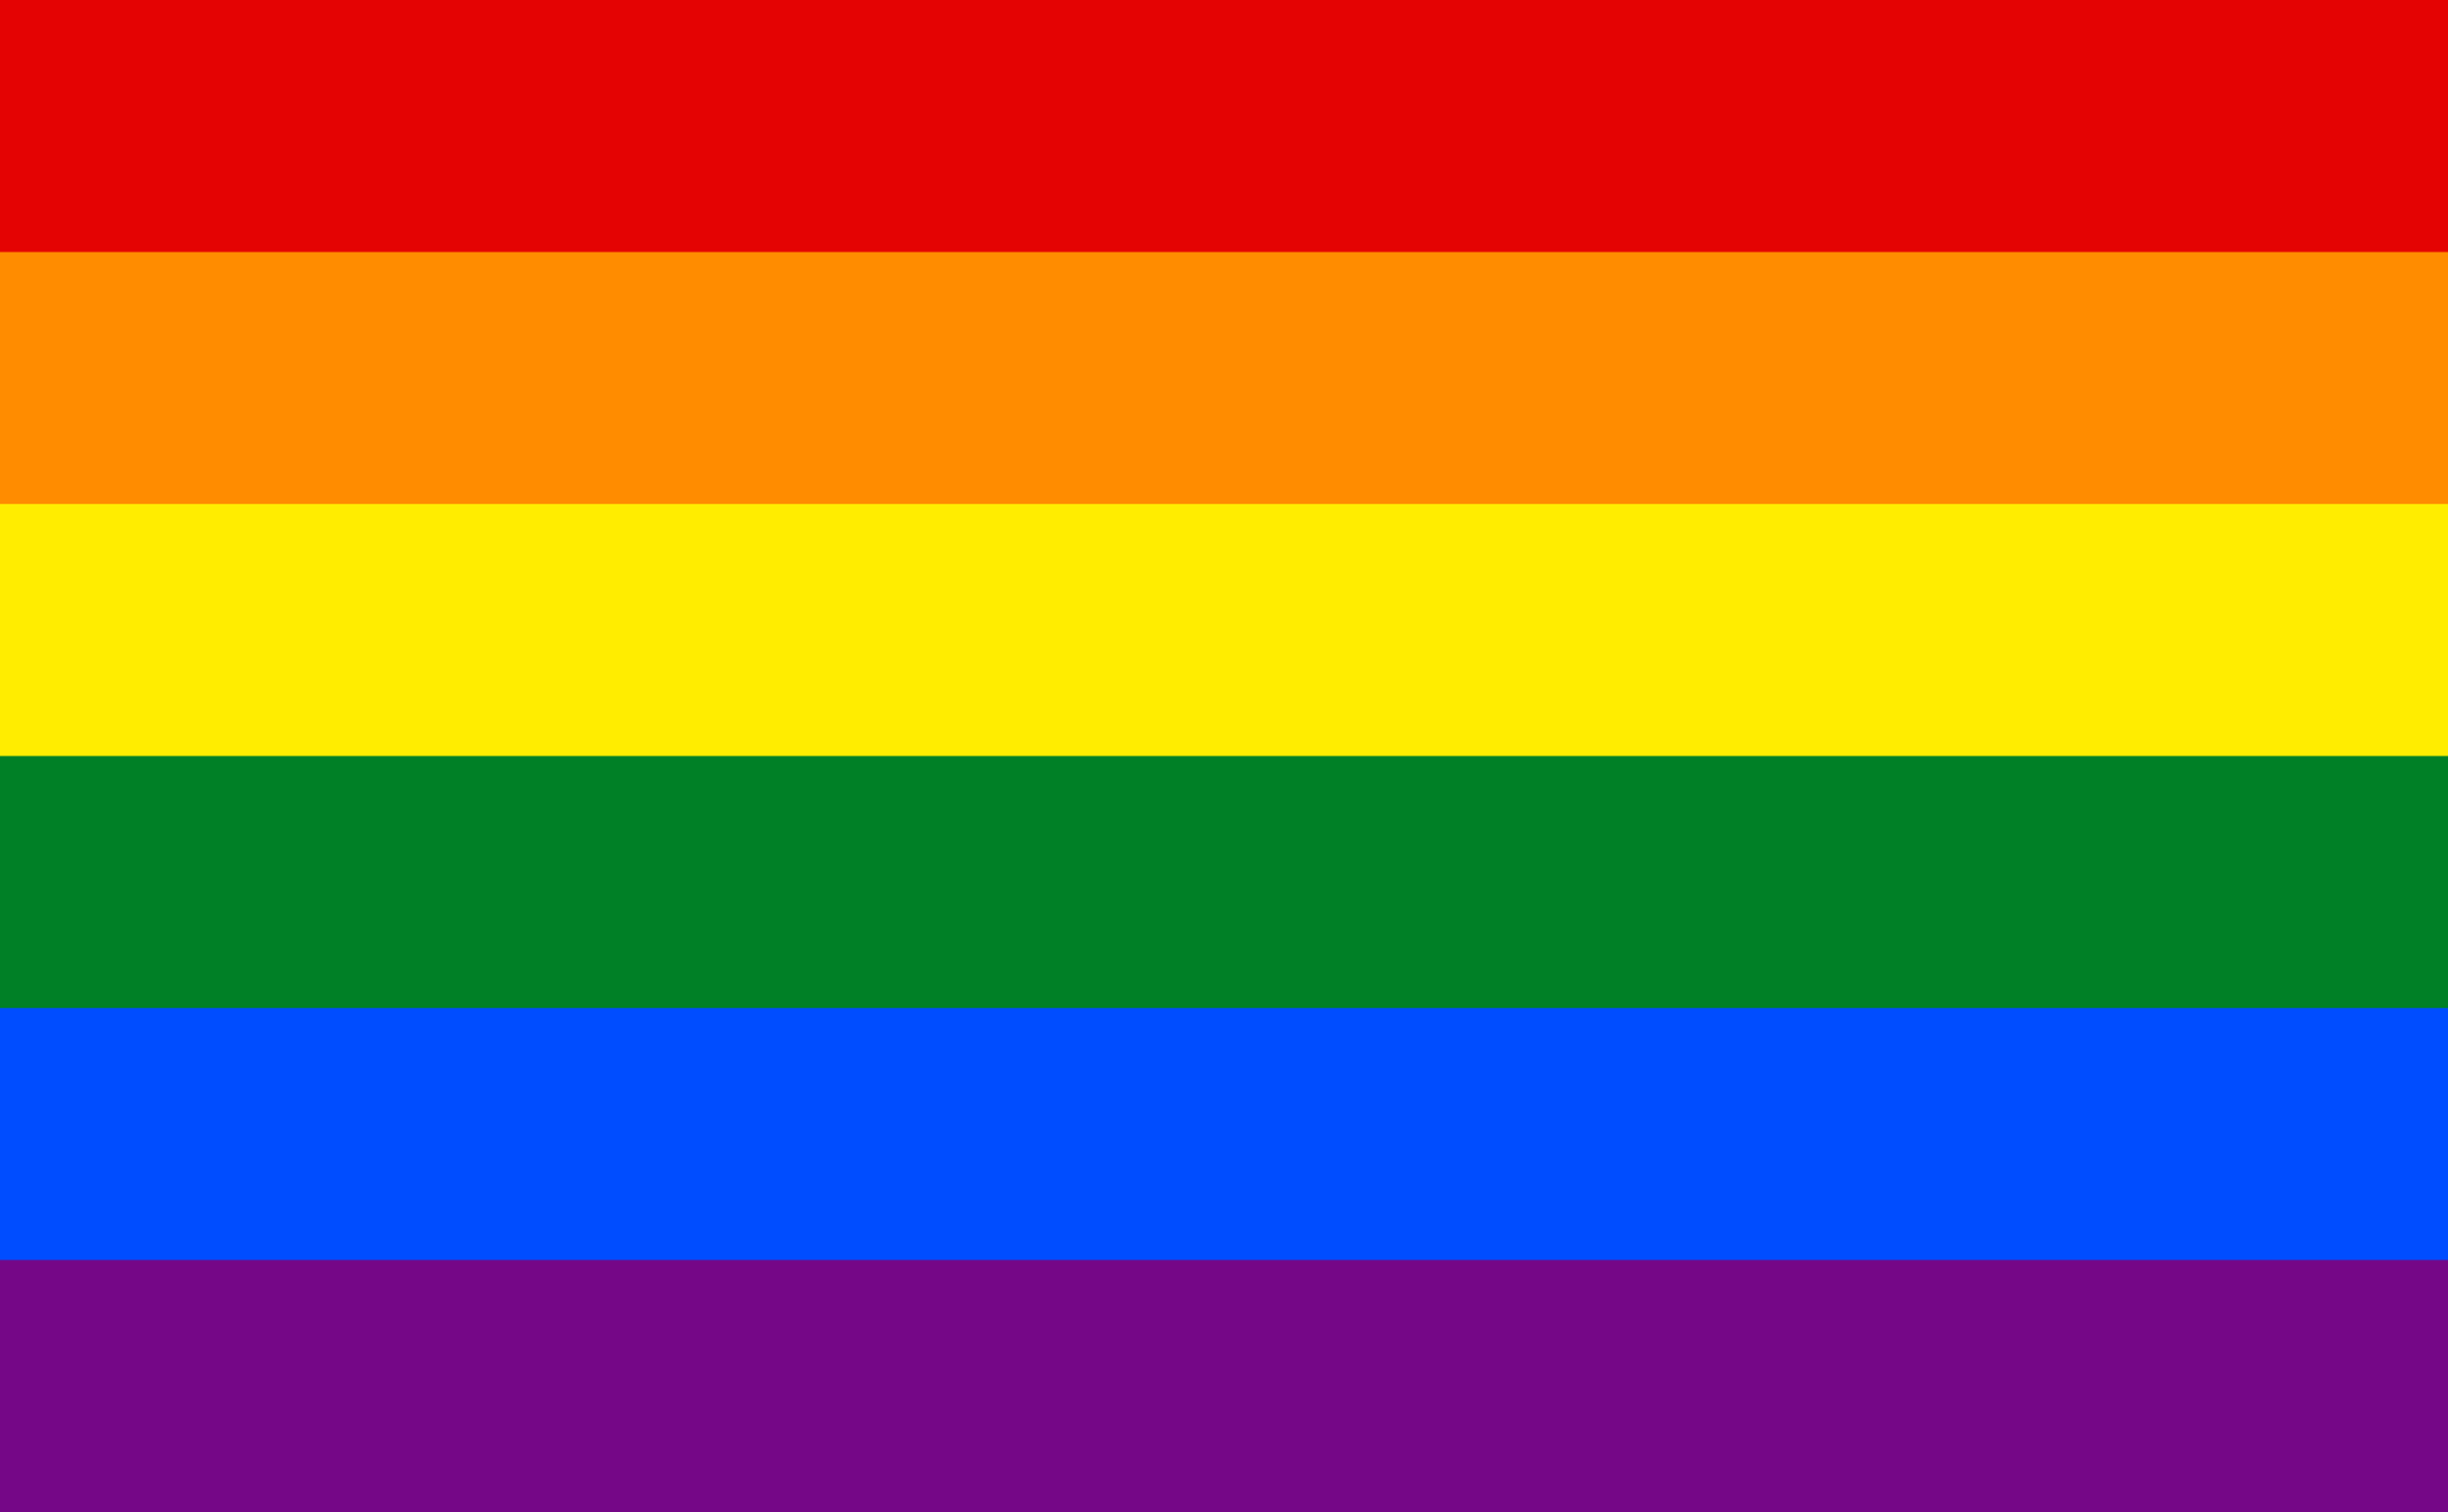 A rainbow flag representing LGBTQ+.